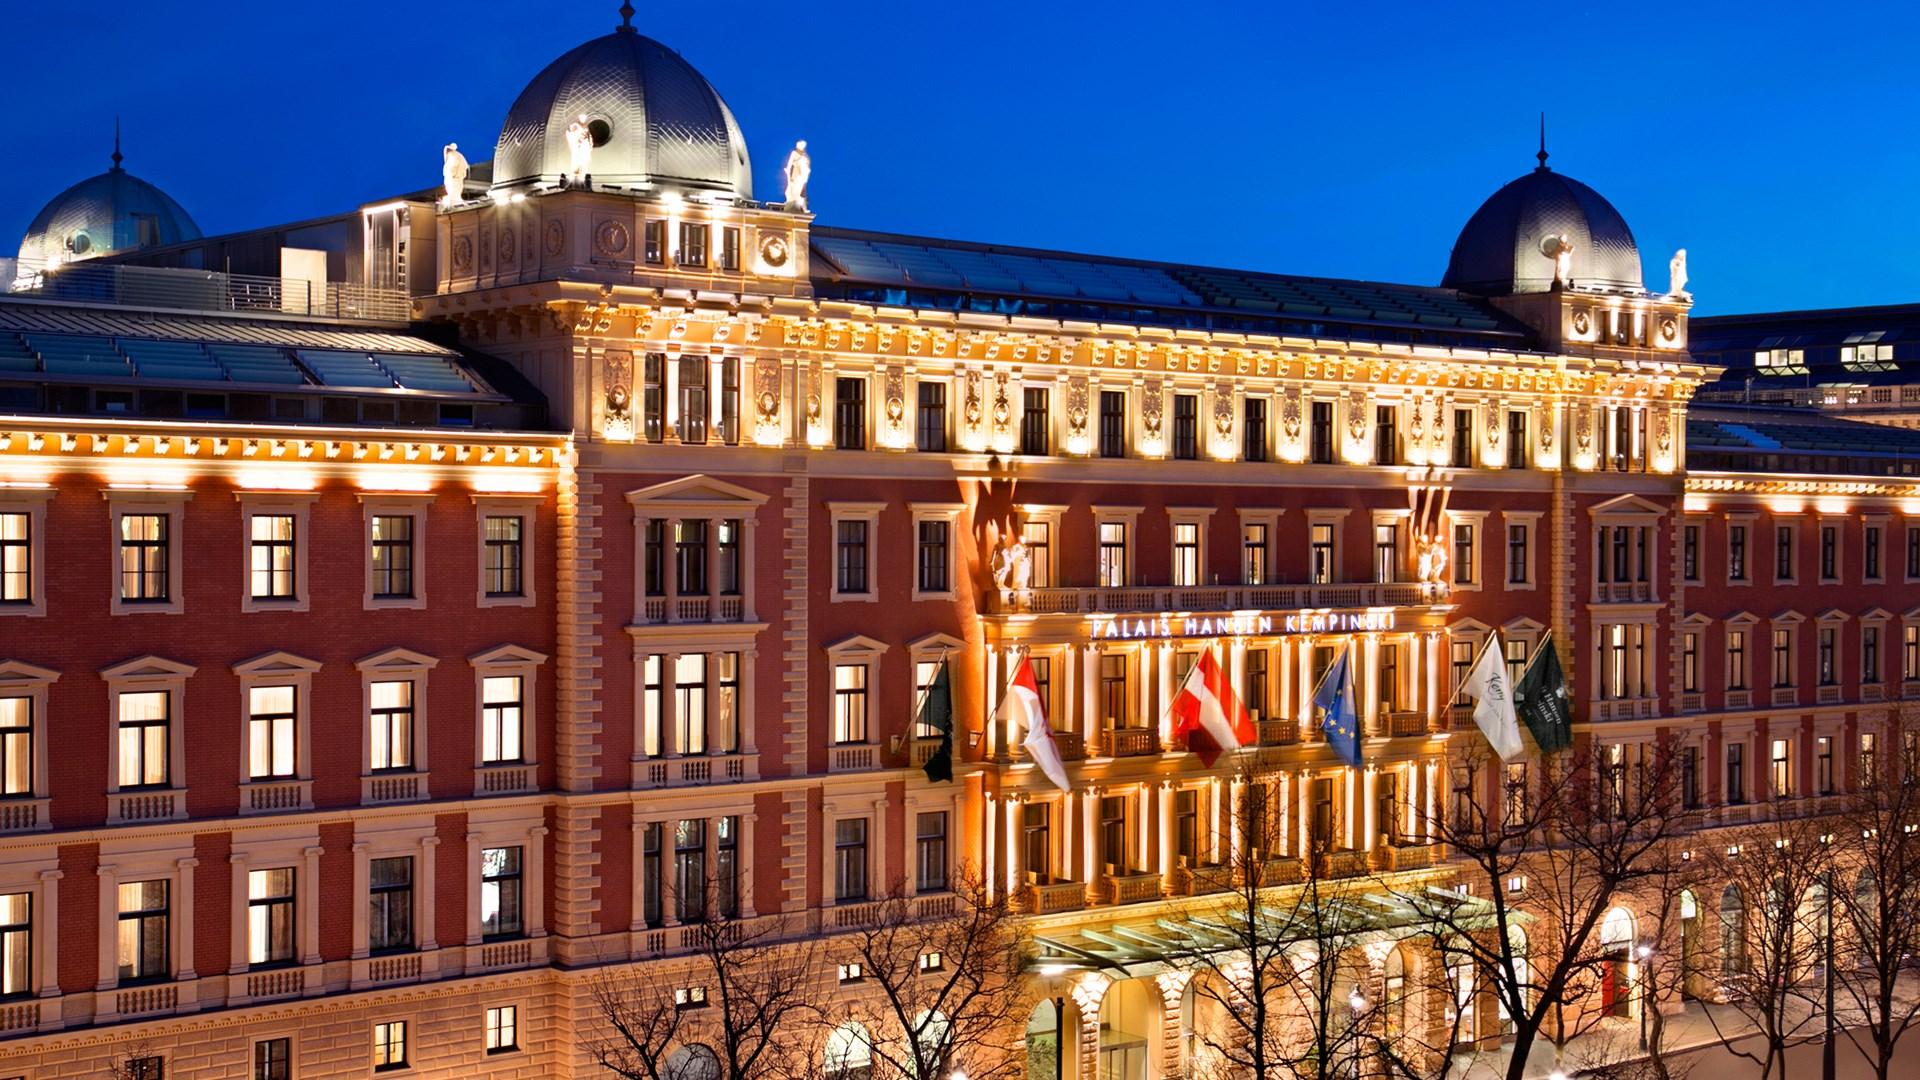 هتل پالاس هانسن کمپینسکی وین